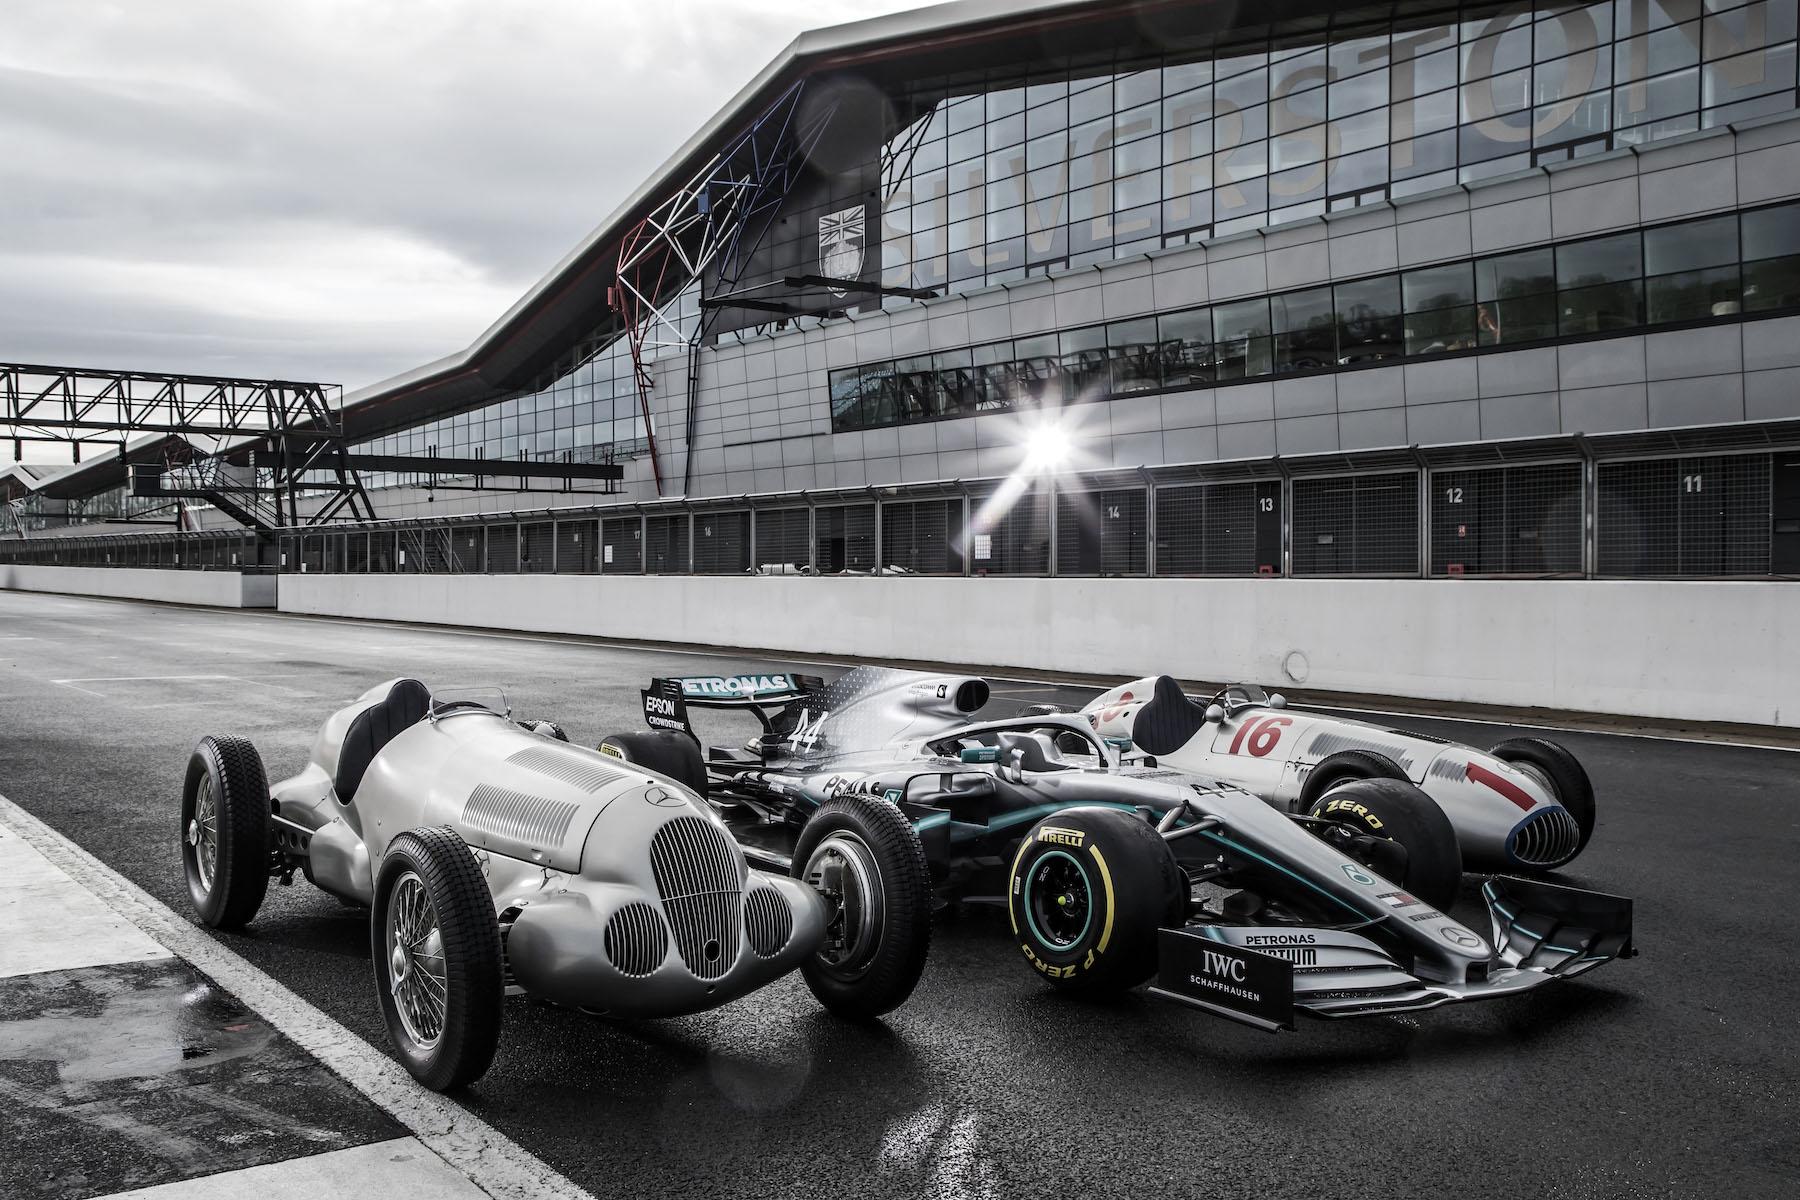 2019 Mercedes 125 years in Motorsports celebration | 2019 Silverstone 8.jpg